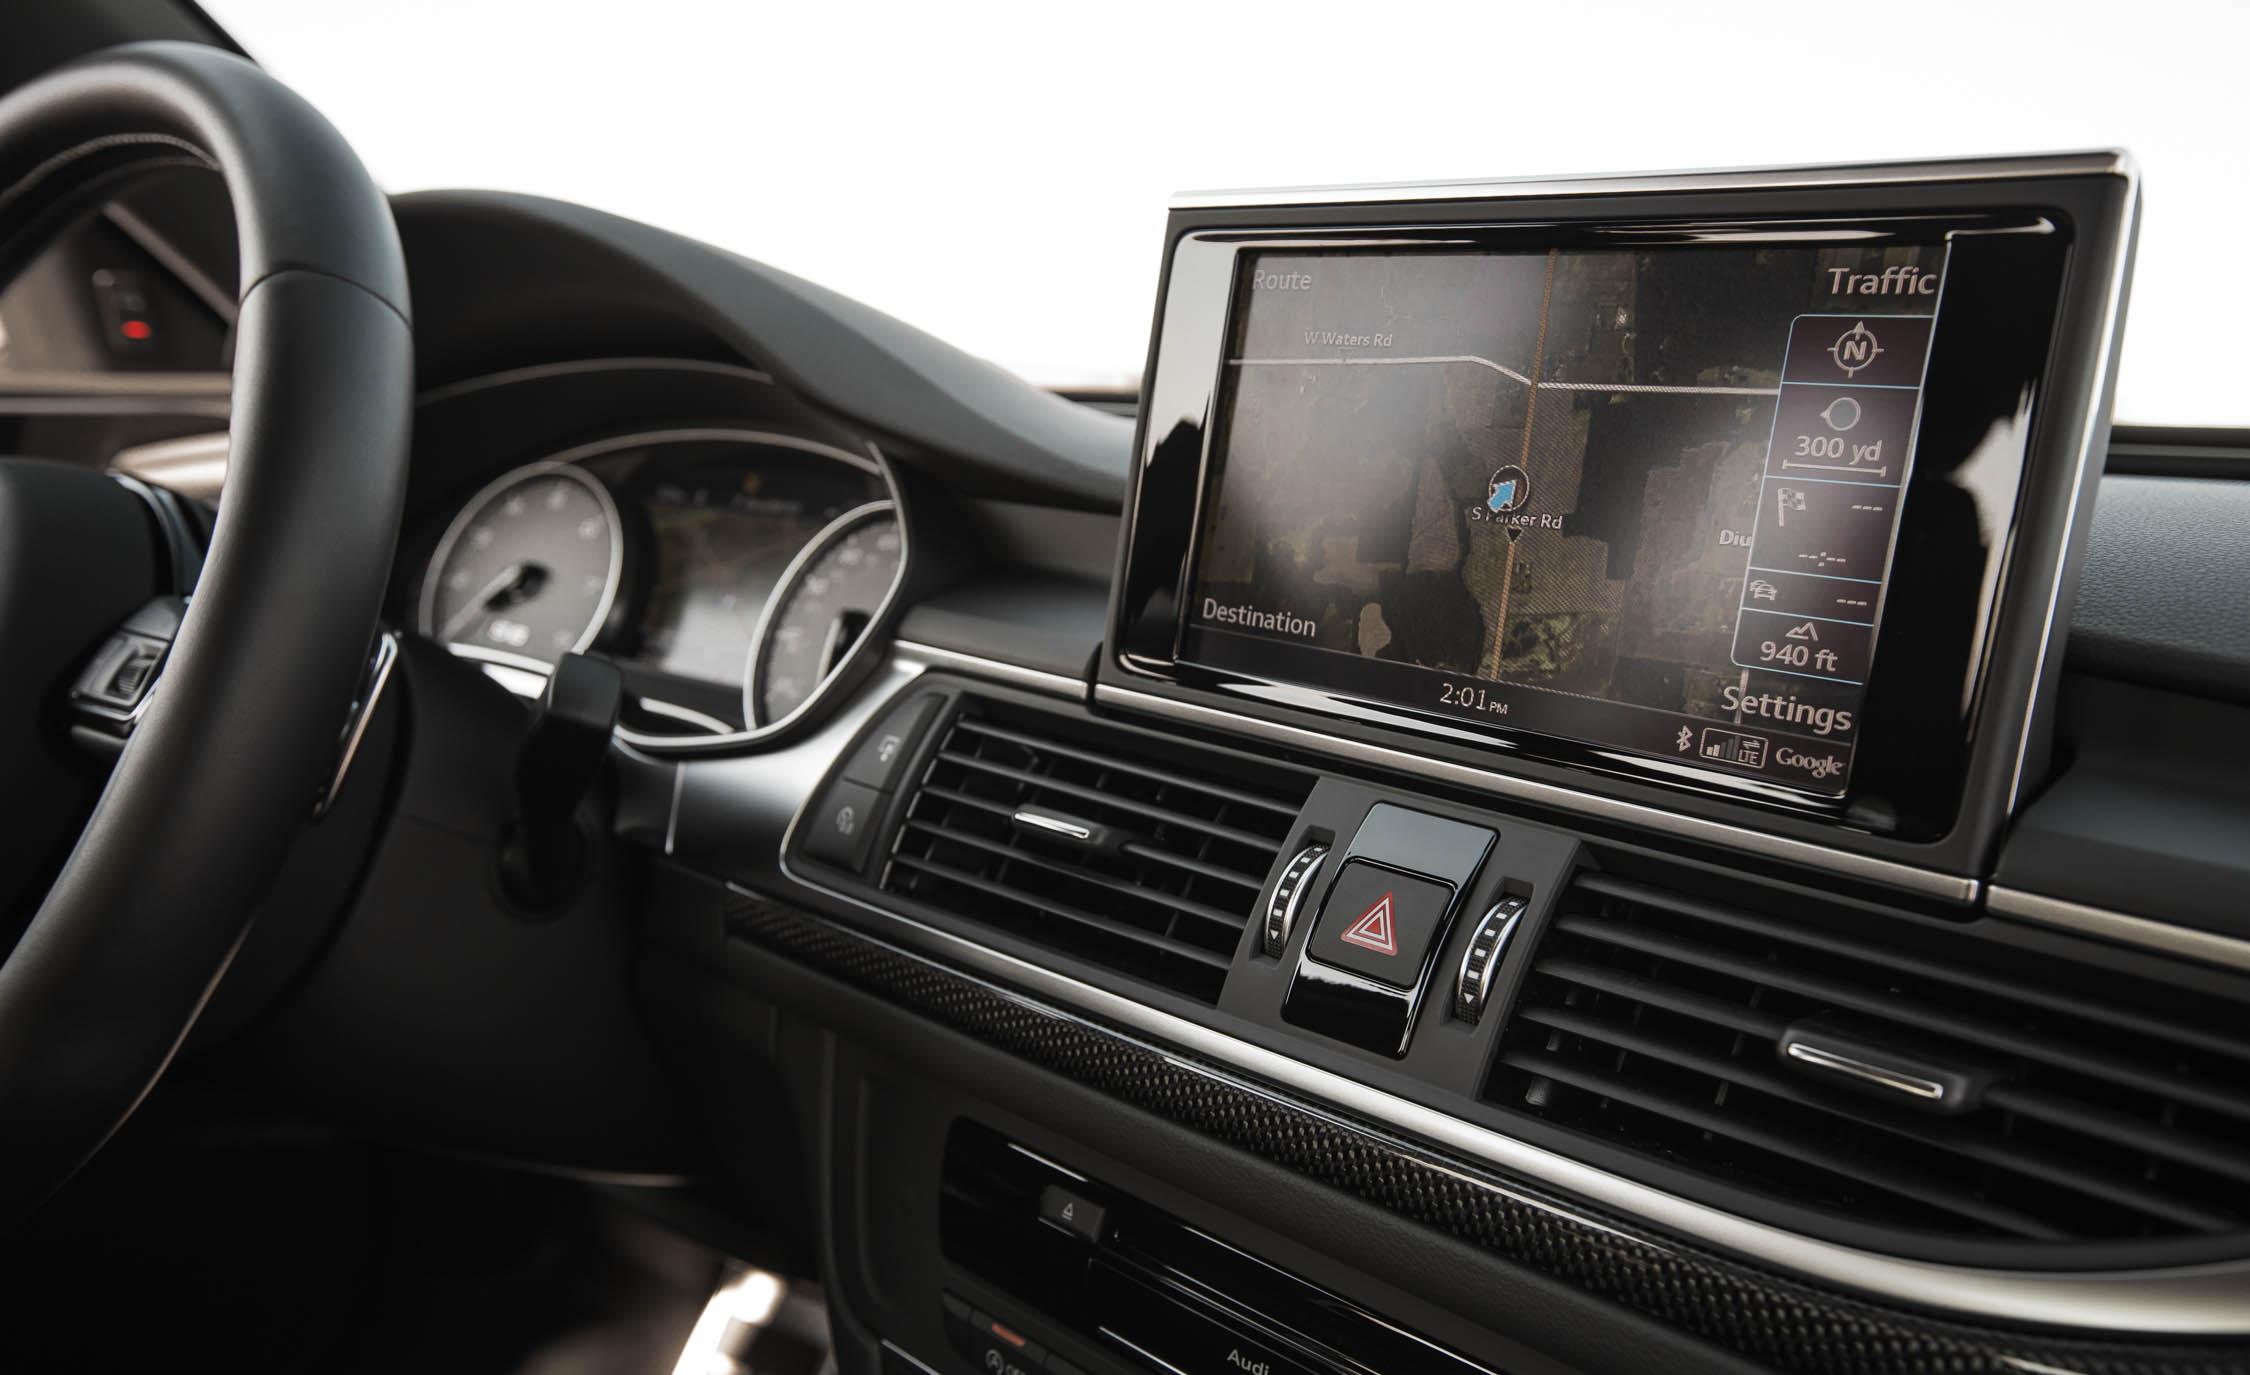 2016 Audi S6 Interior Head Unit Screen